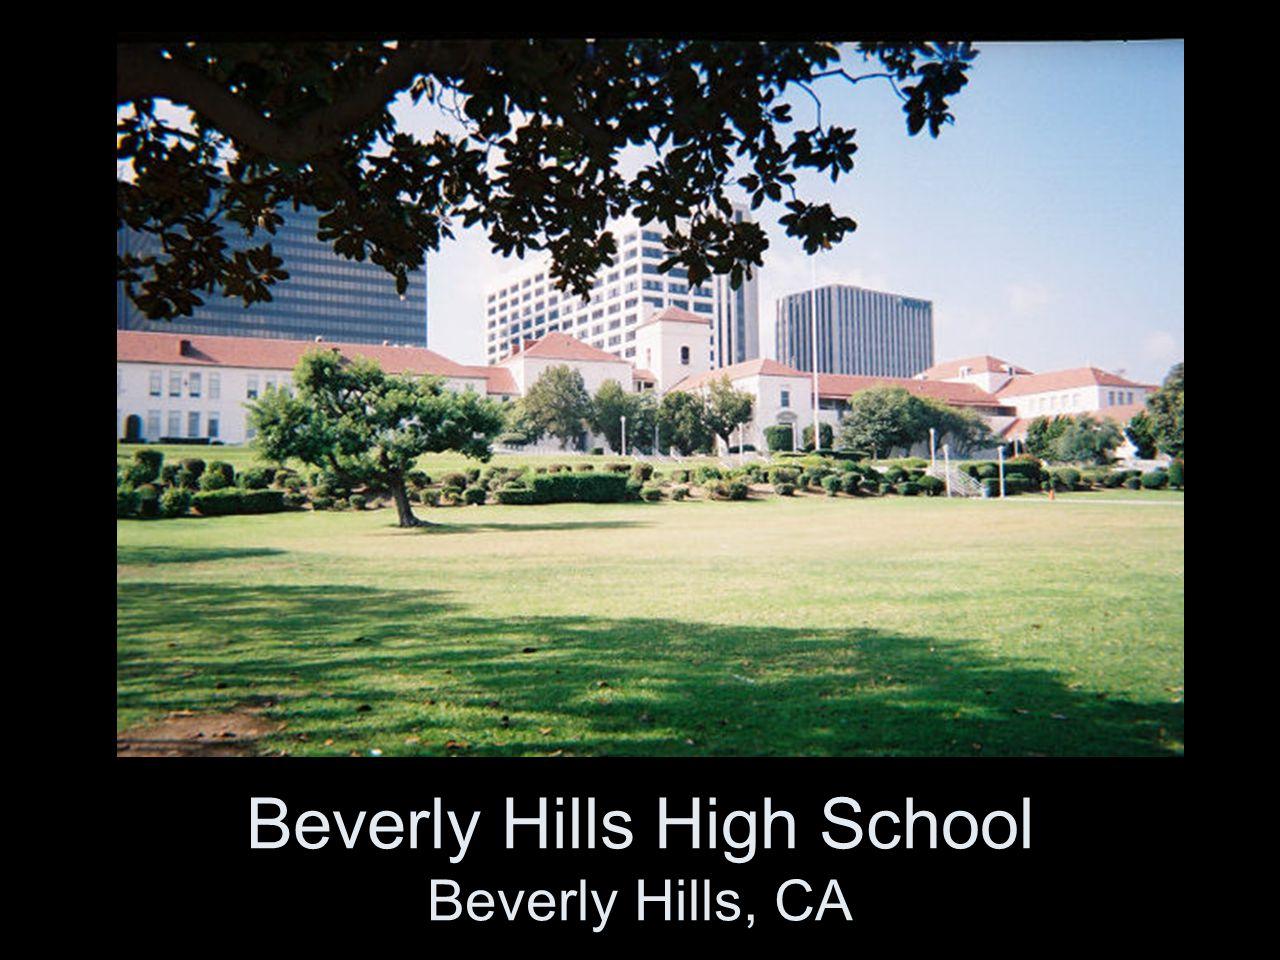 Beverly Hills High School Beverly Hills, CA